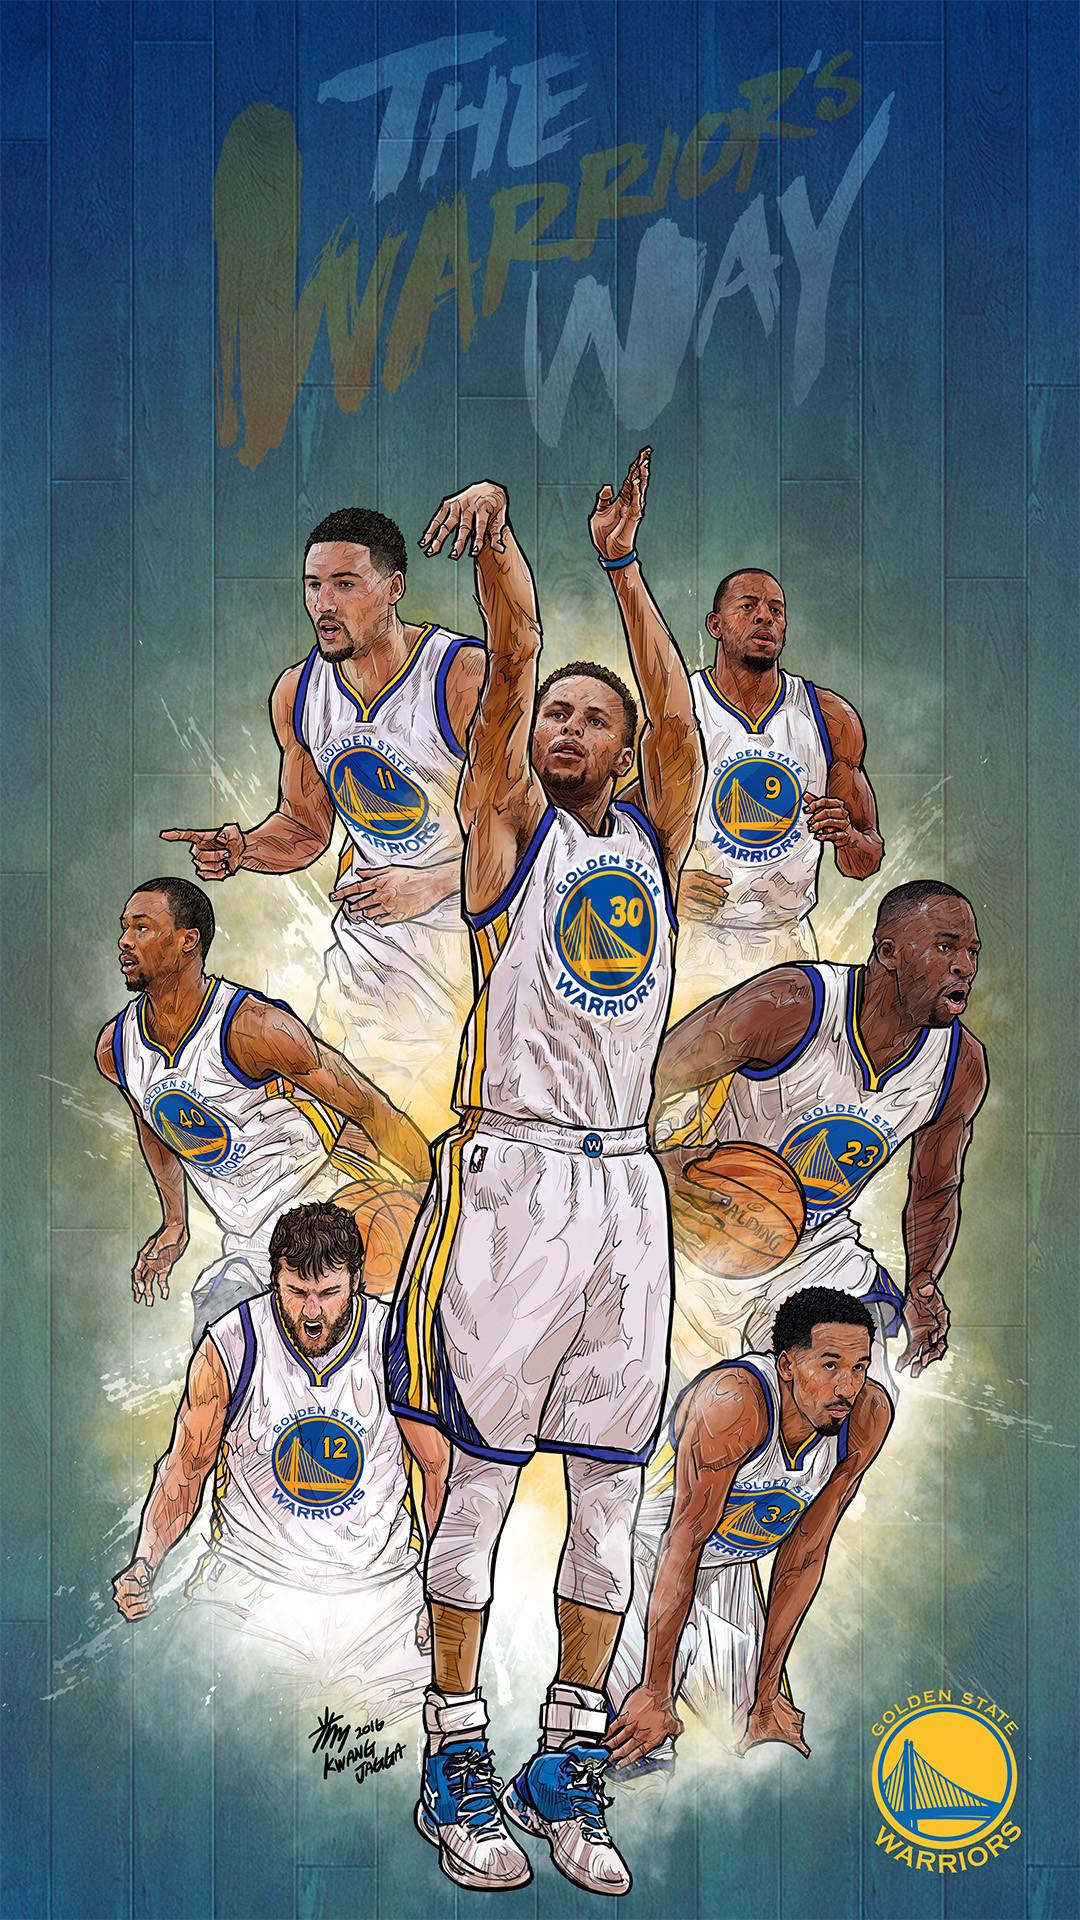 Best 25+ Warriors wallpaper ideas on Pinterest | Golden state warriors  tonight, Golden state warriors playoffs and Warriors game tonight